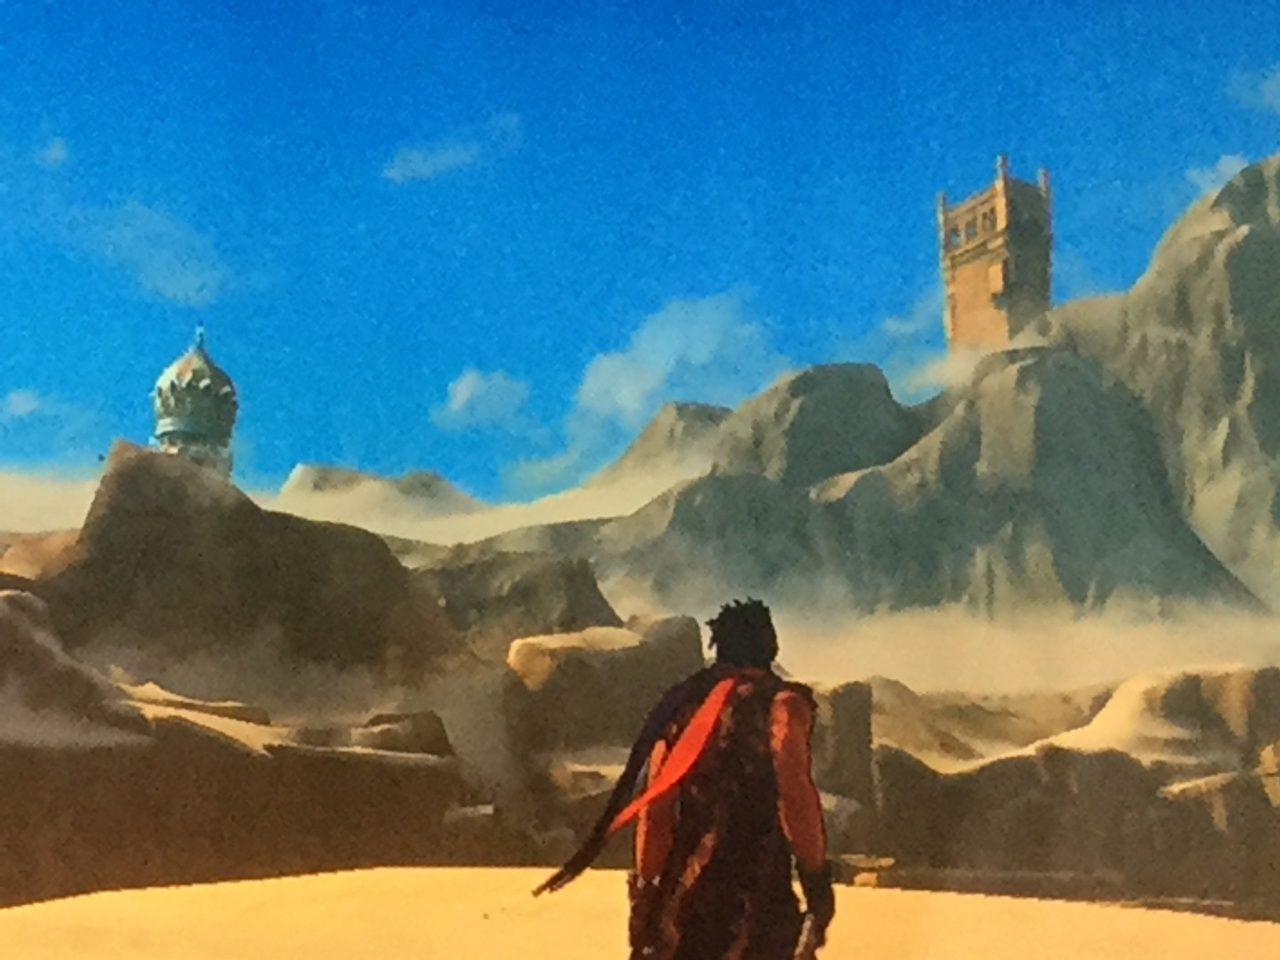 Prince of Persia (2008). (Bild: Lennart Koch)